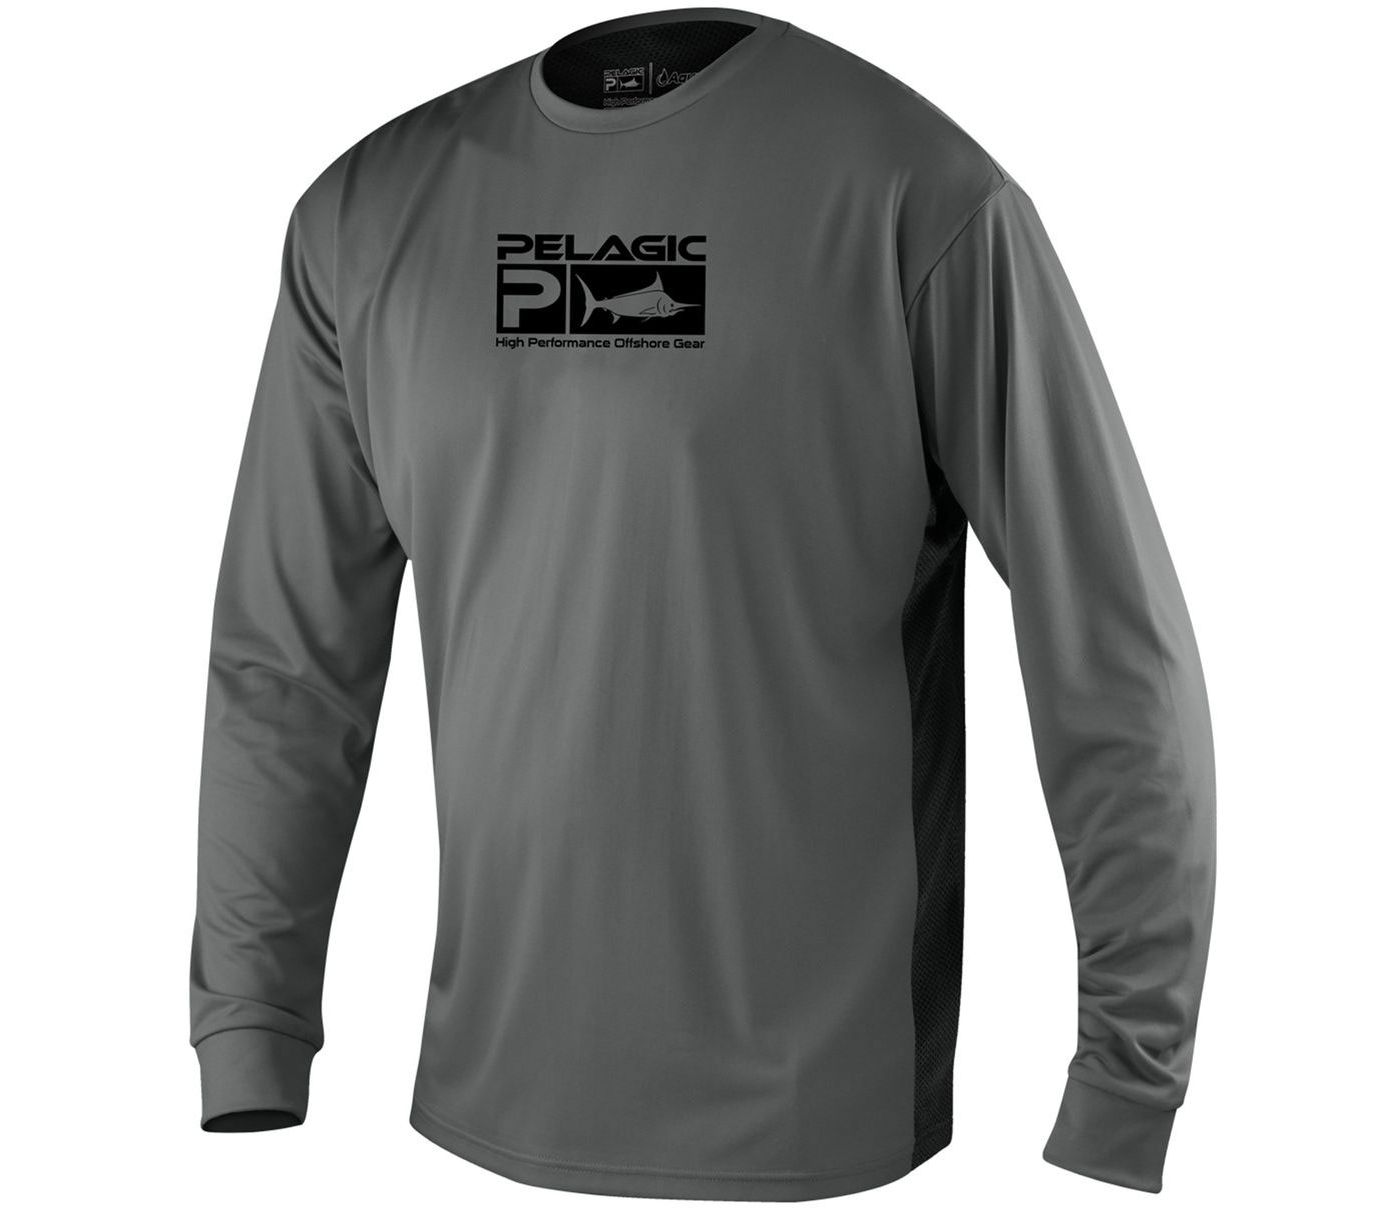 Pelagic Men's AquaTek Pro Long Sleeve Performance Shirt